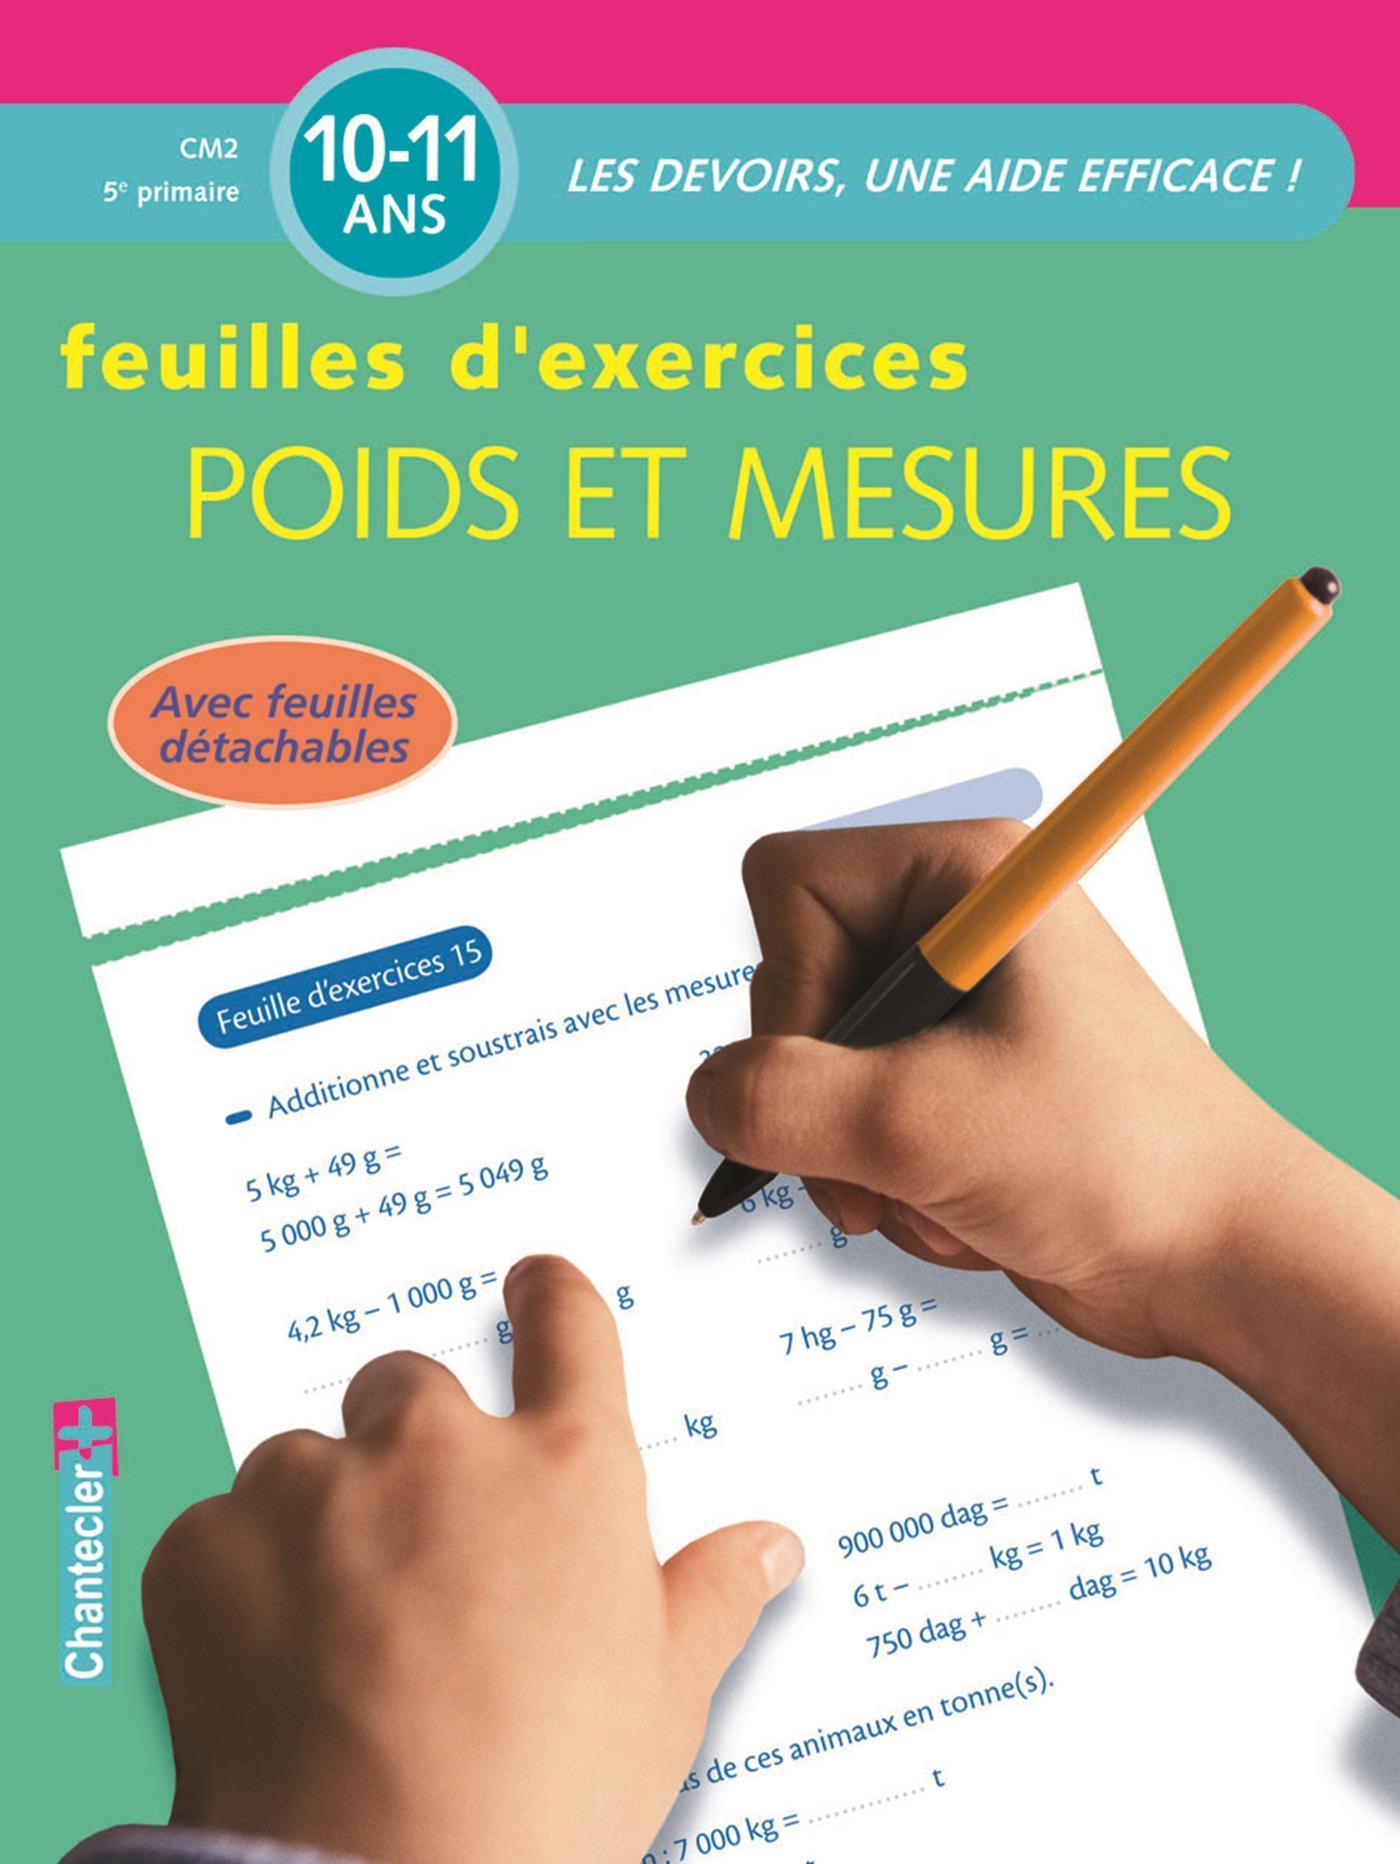 FEUILLES D'EX. POIDS ET MESURES (10-11 A.)